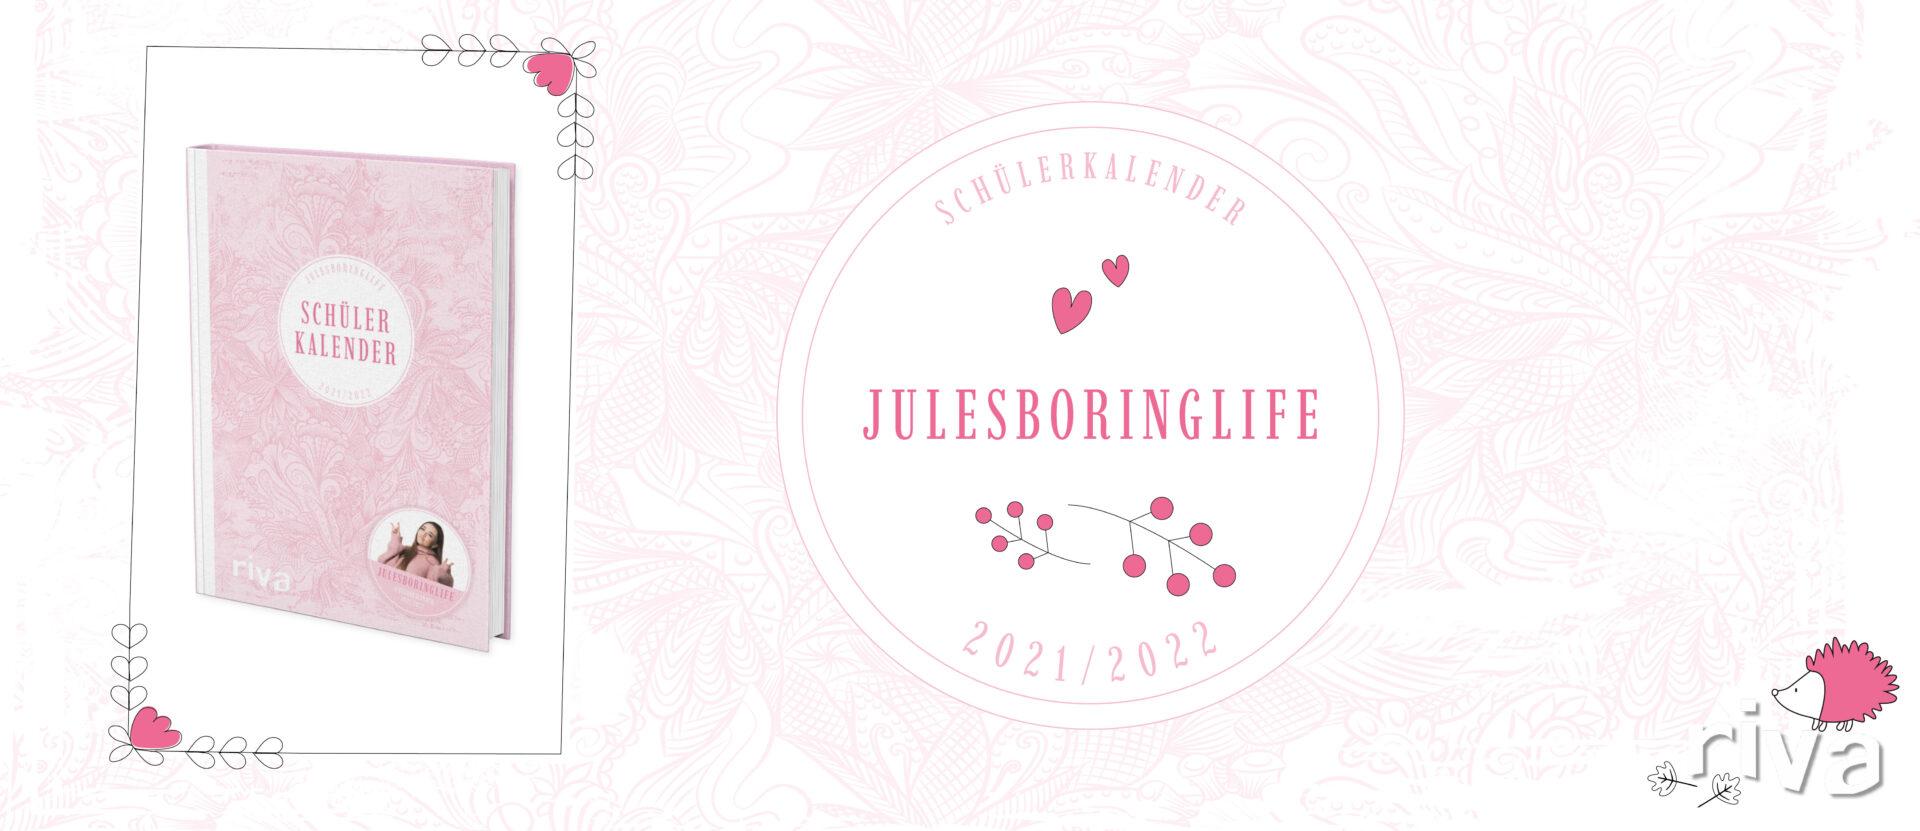 Julesboringlife Schülerkalender